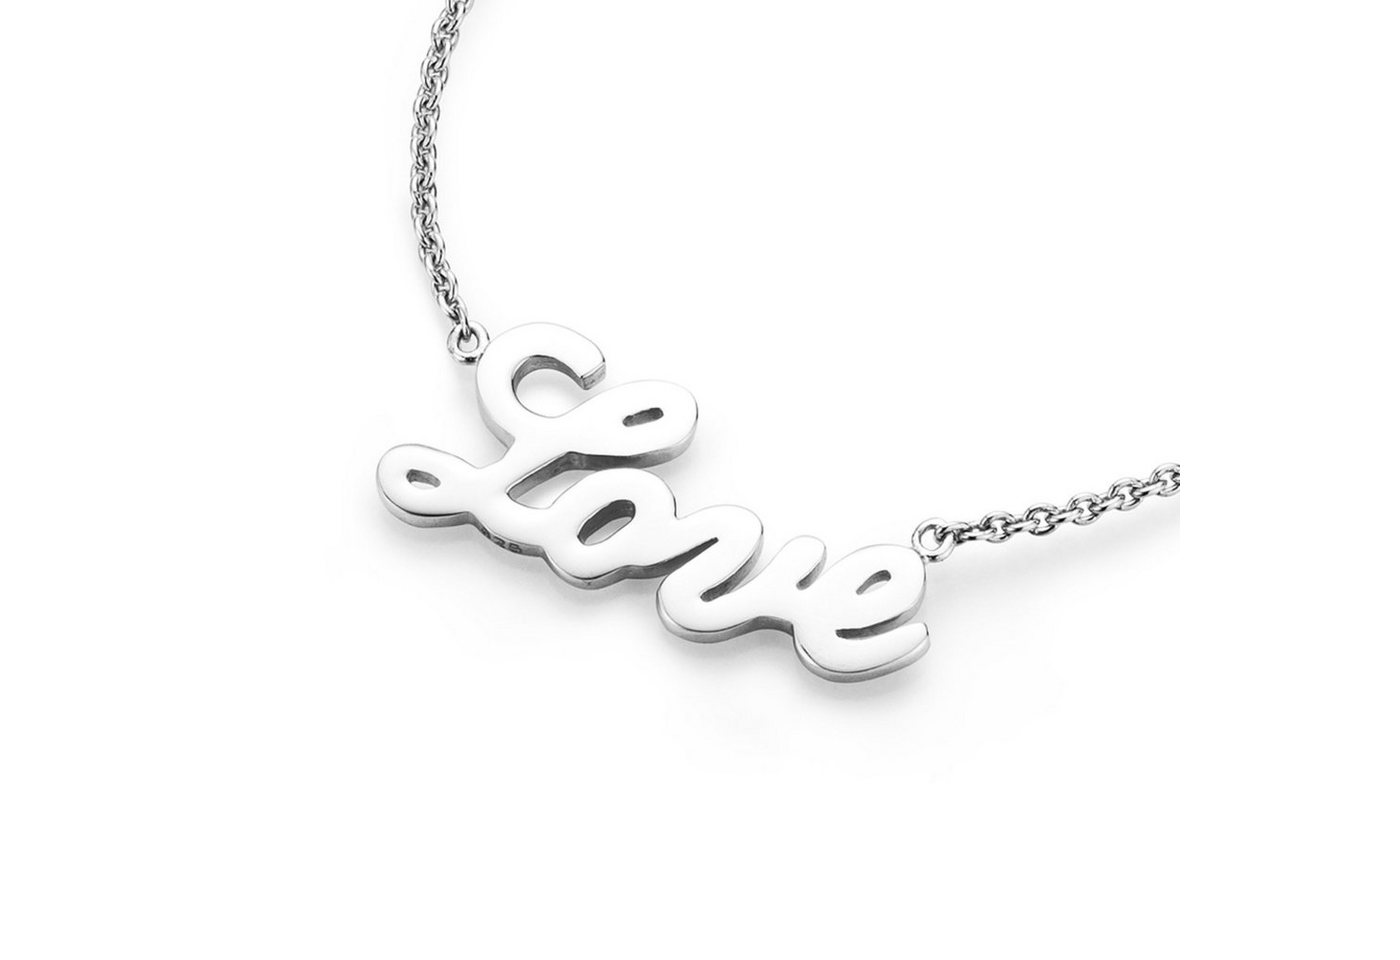 Smart Jewel Statementkette »Love - Schriftzug« | Schmuck > Halsketten > Statementketten | Smart Jewel